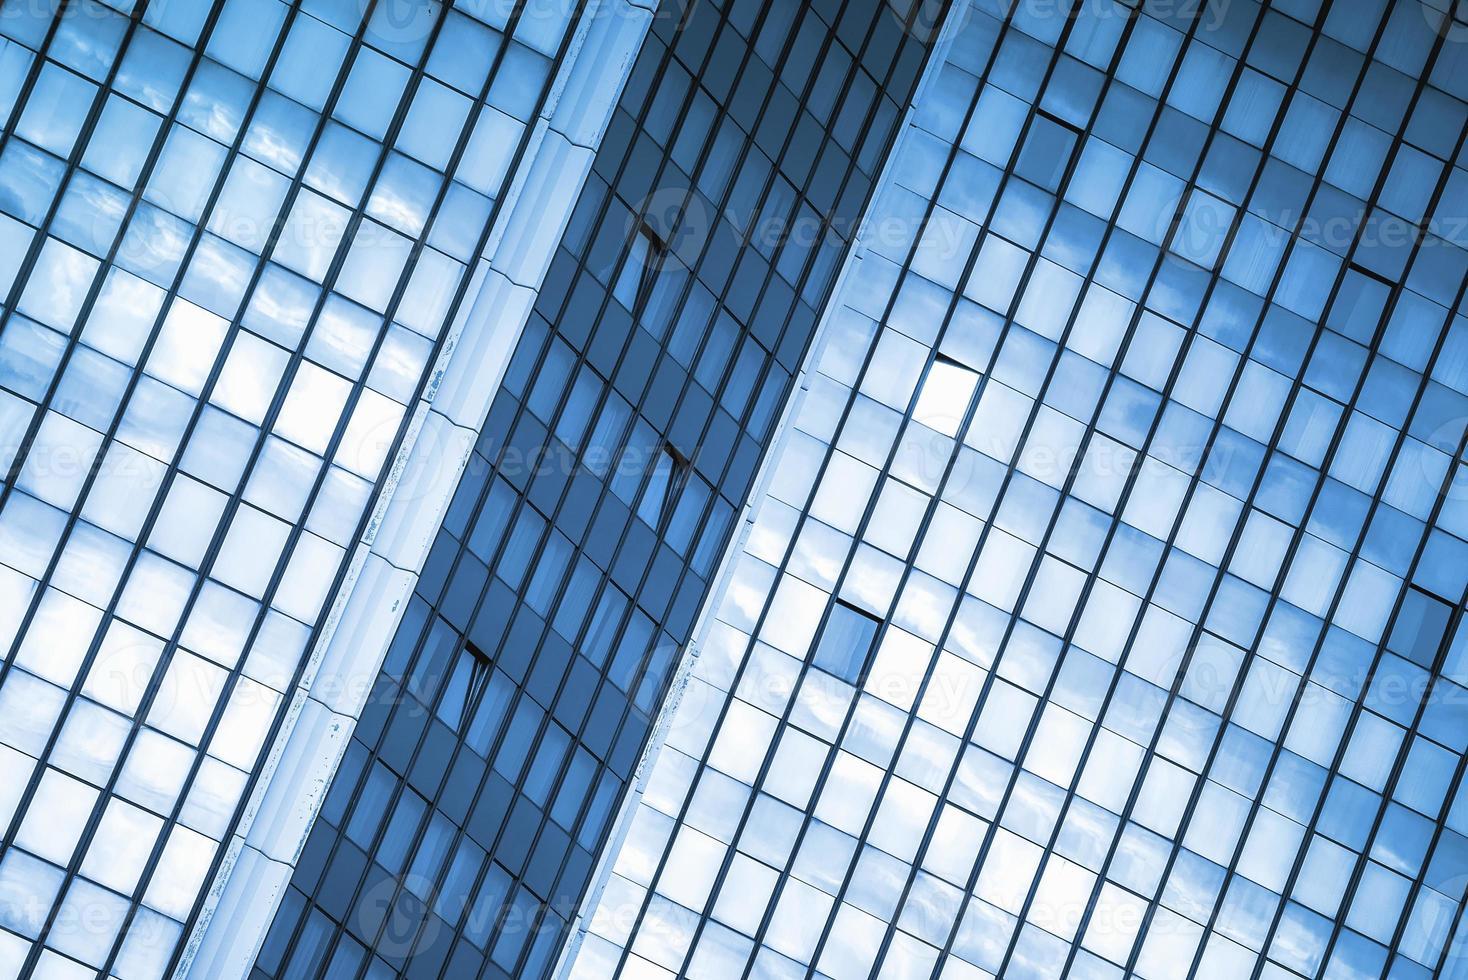 edificio de oficinas de negocios moderno ventanas patrón repetitivo foto